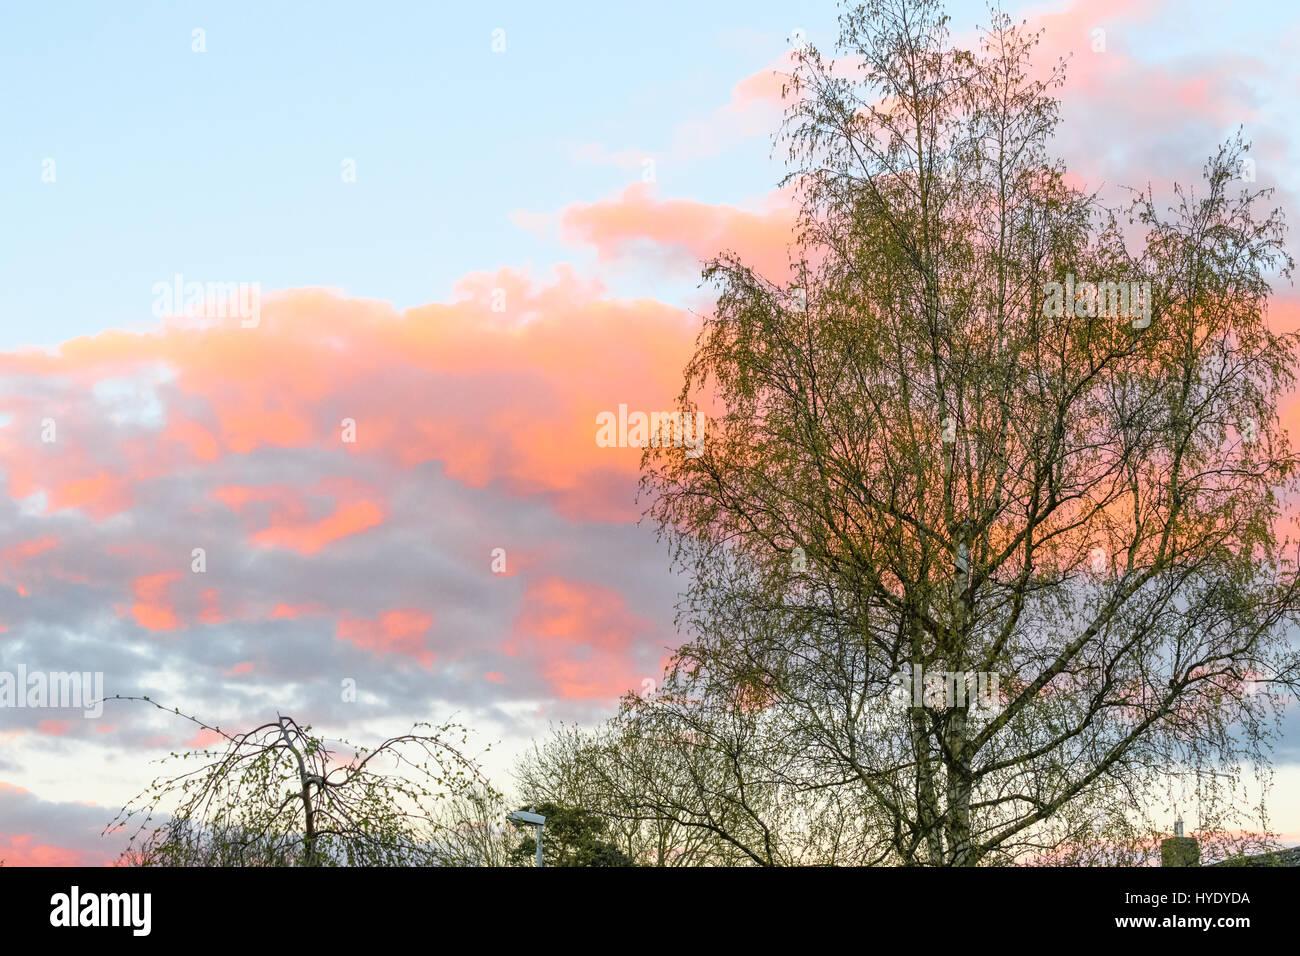 Red sky at night, shepherd's delight;  red sky in the morning, shepherd's warning. - Stock Image